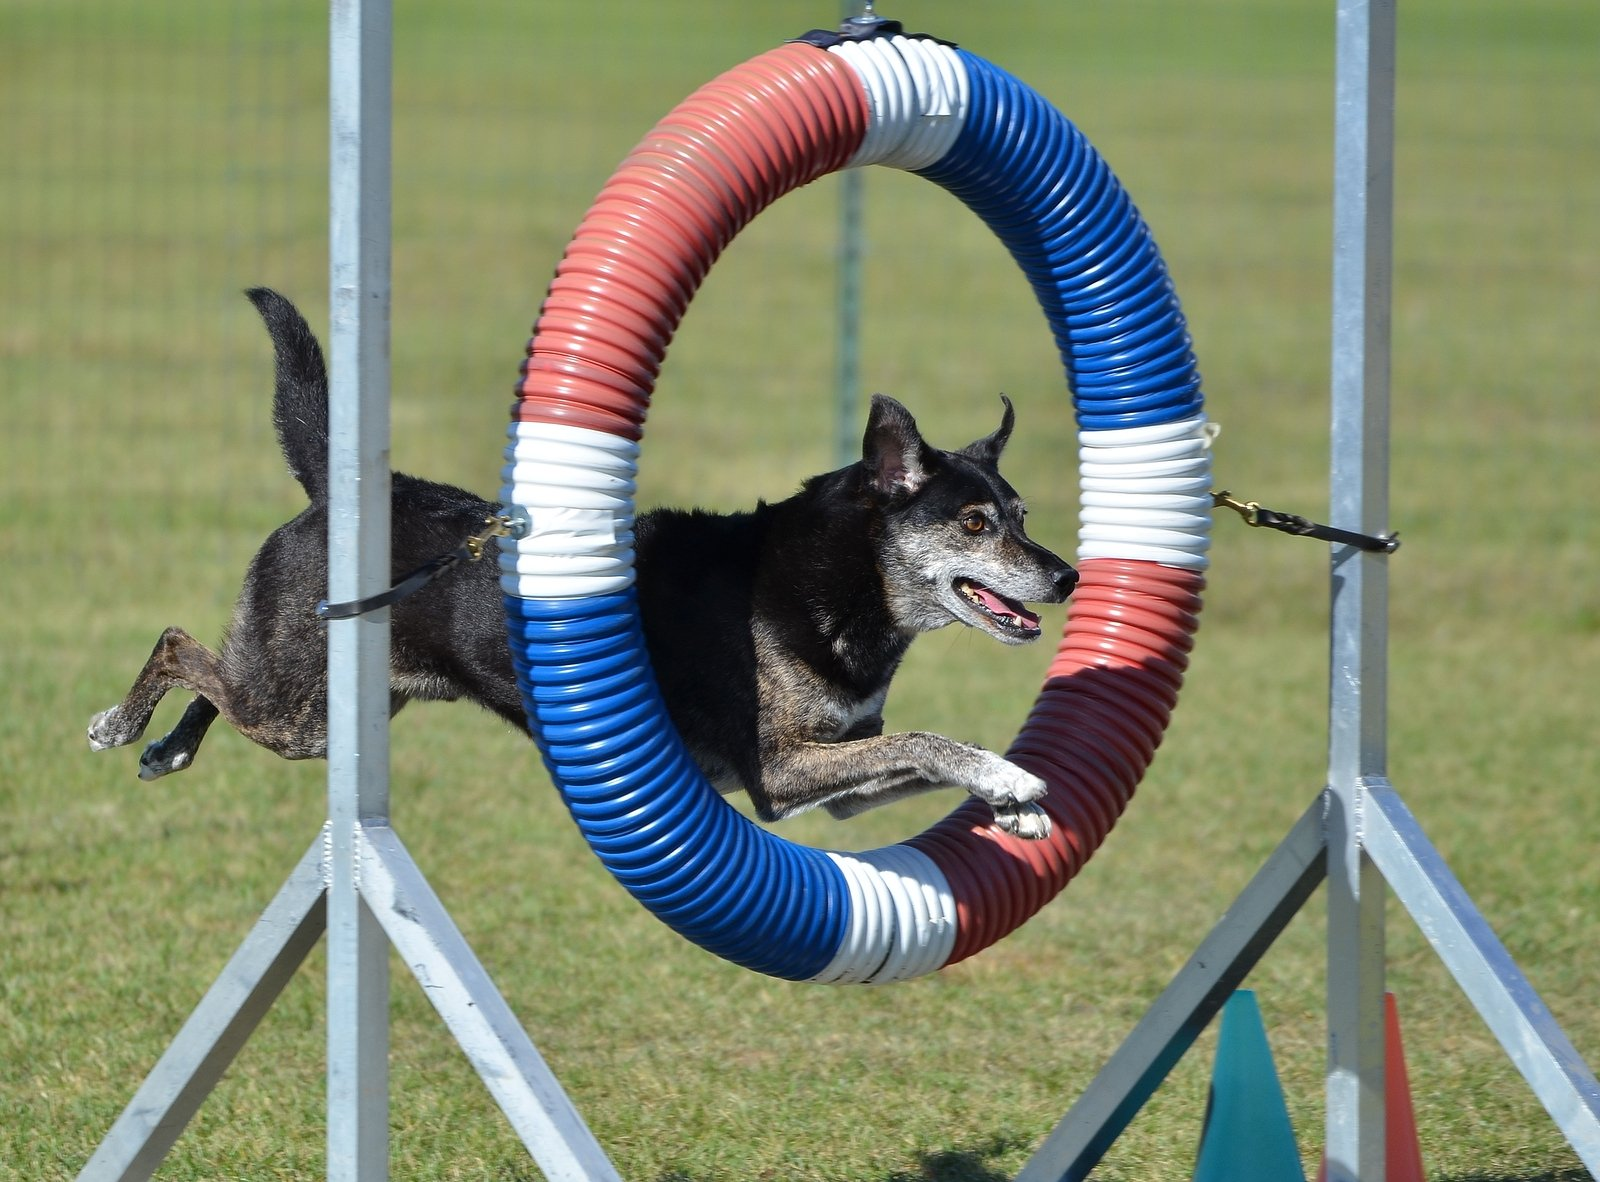 Mixed Breed Dog at agility training